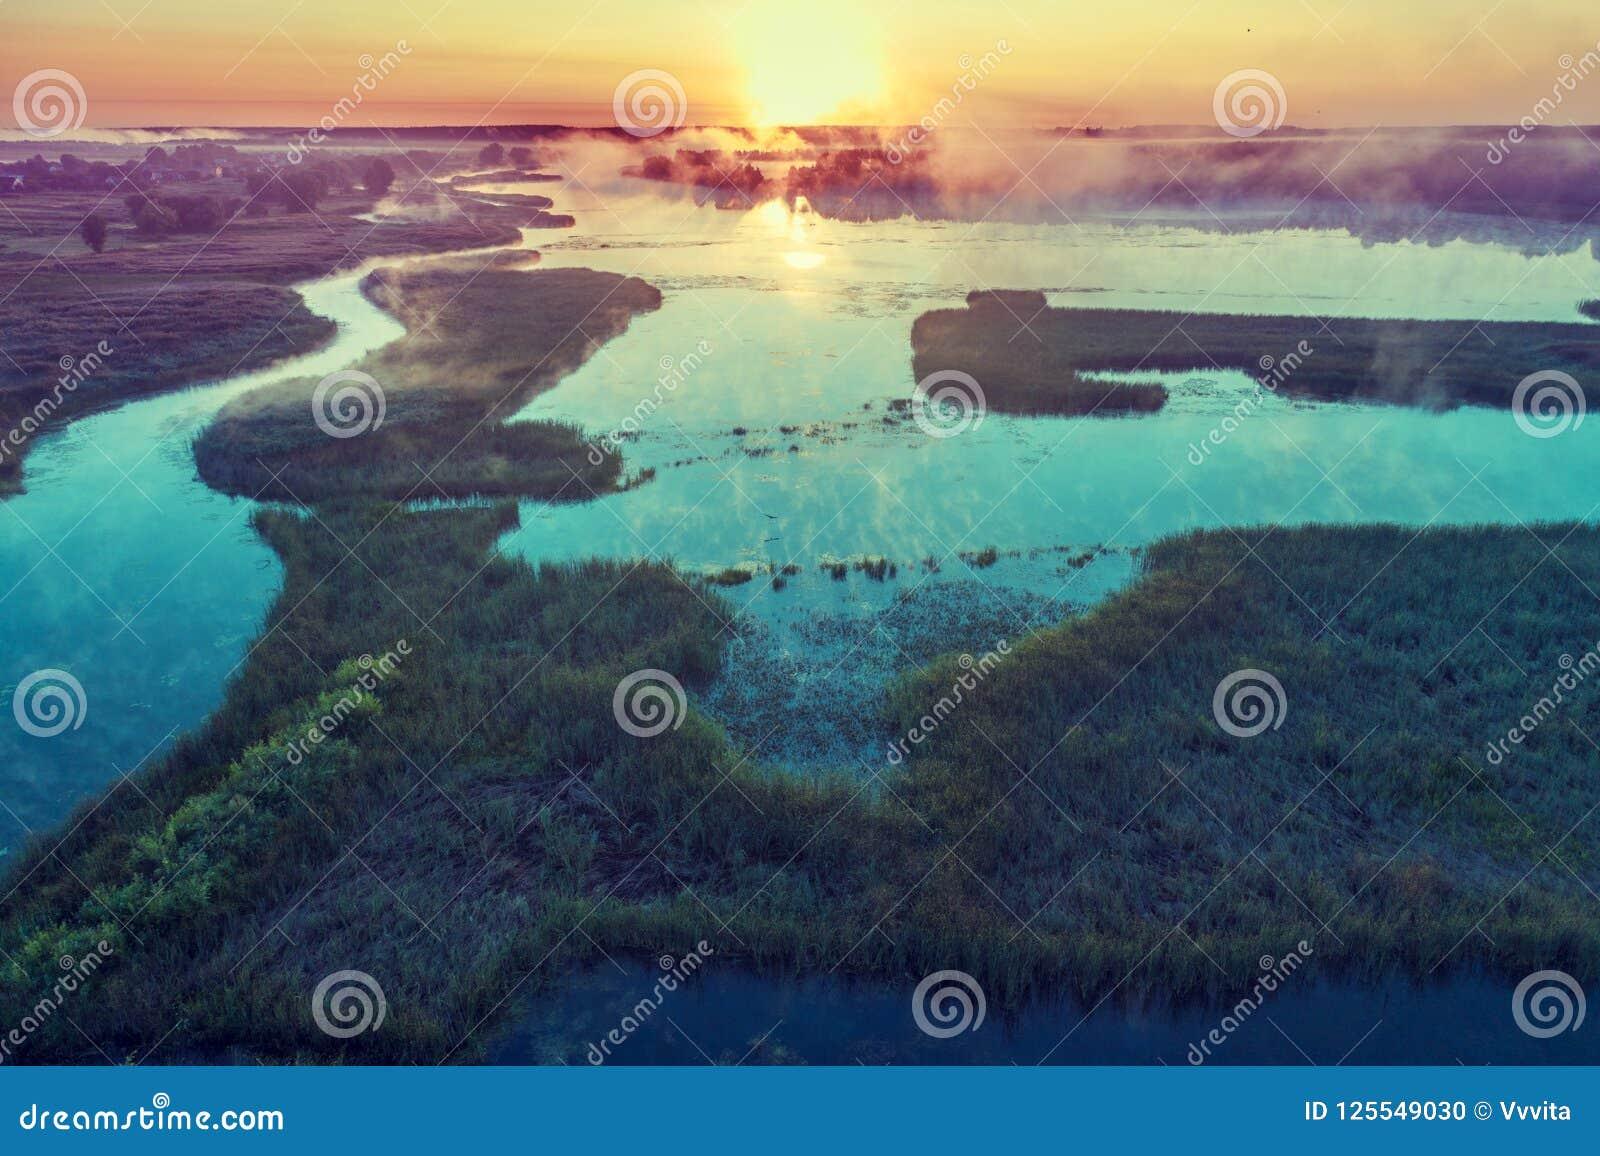 Magische nevelige zonsopgang over de rivier Lucht Mening